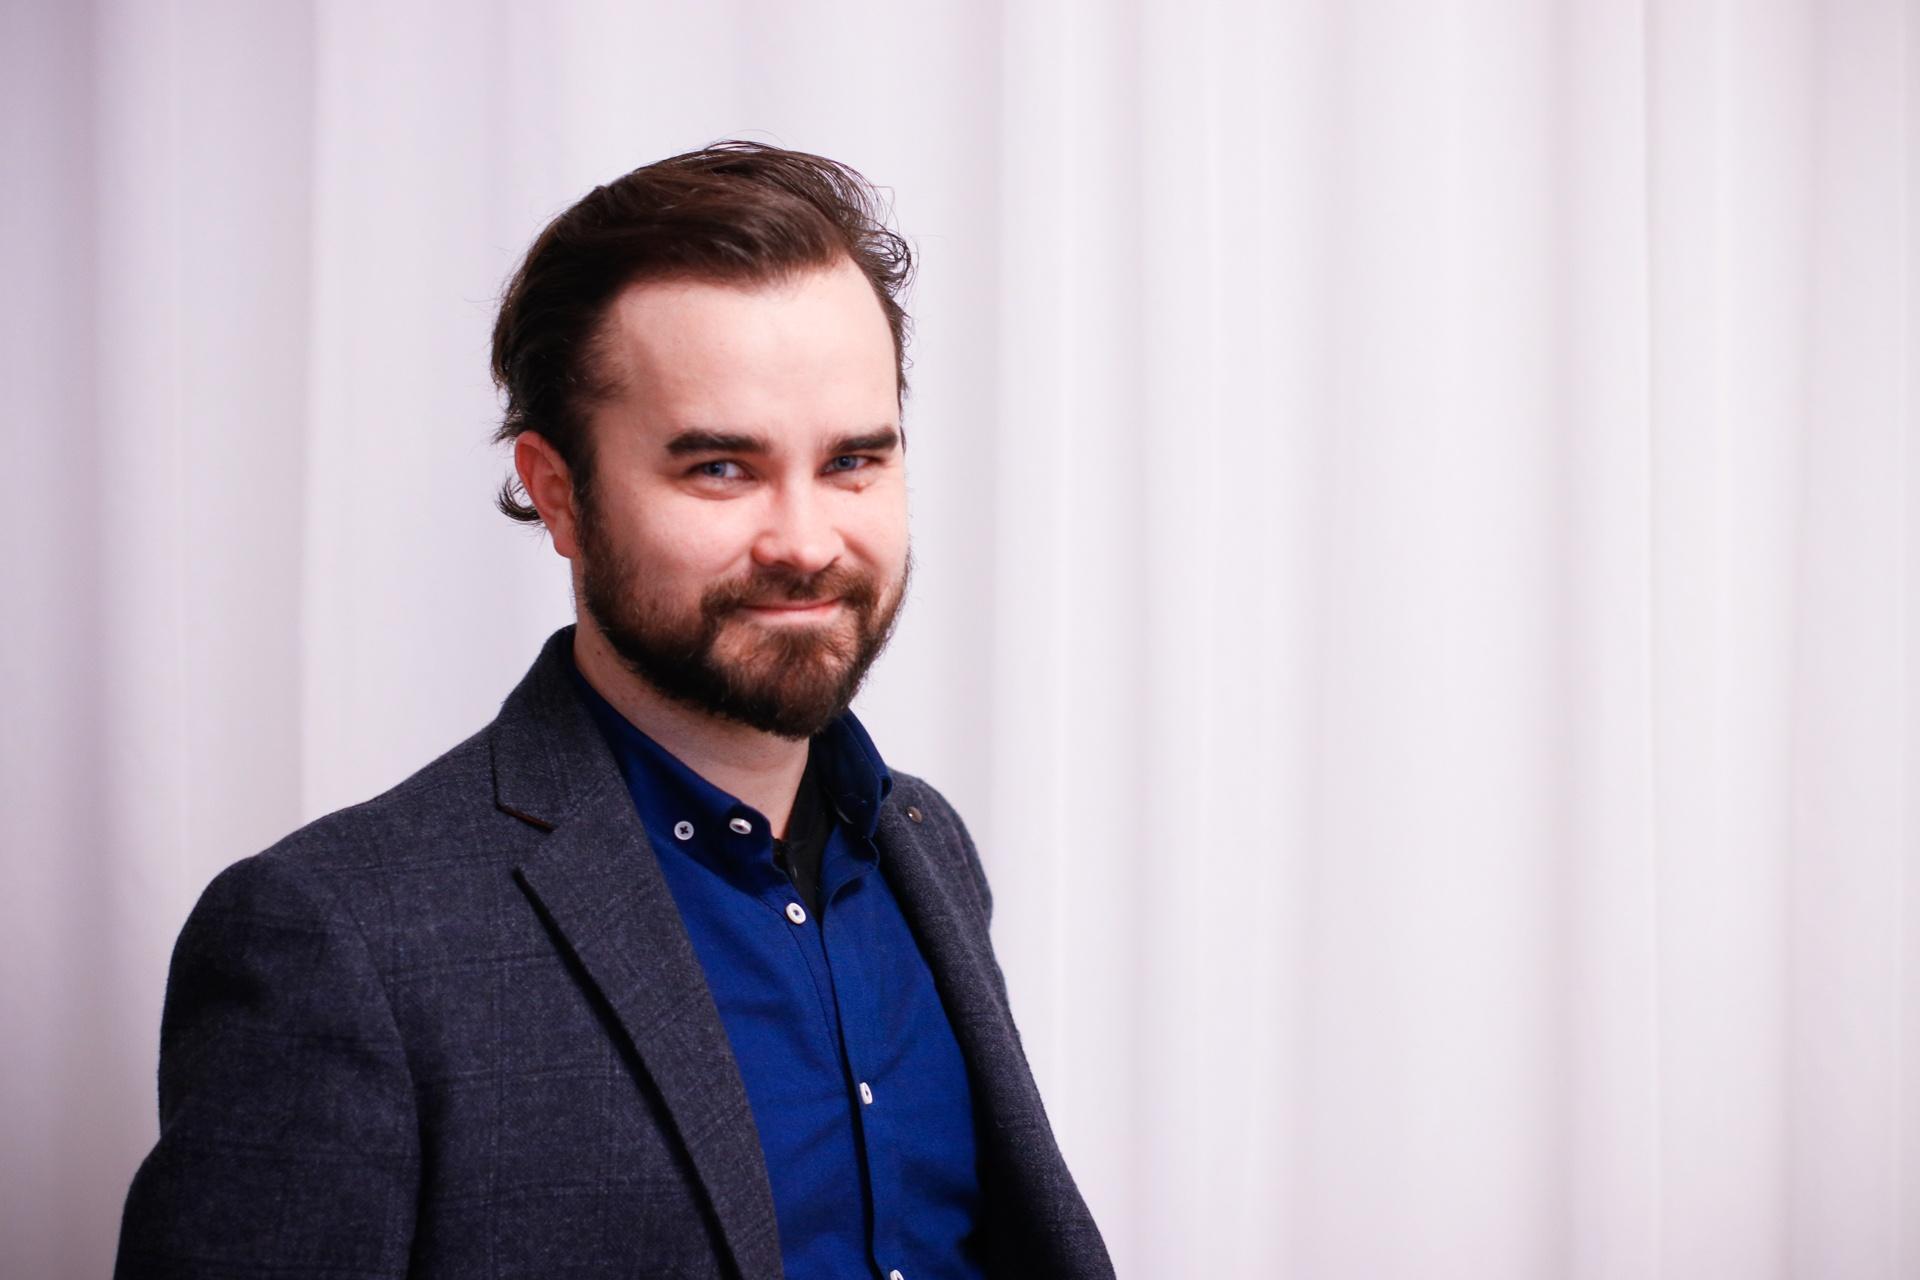 Hannes Merisaari